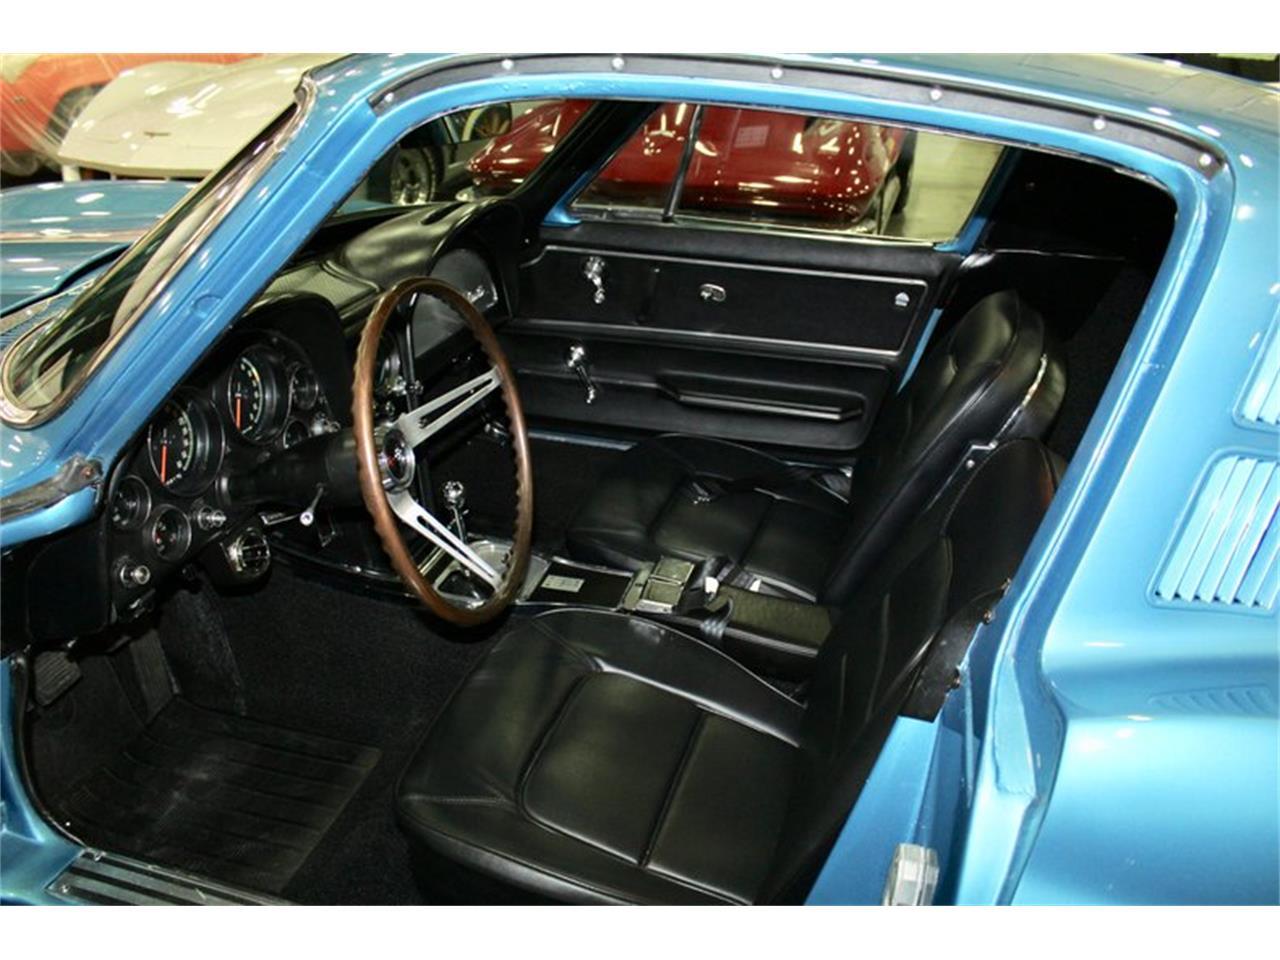 1965 Chevrolet Corvette (CC-1250343) for sale in Sarasota, Florida